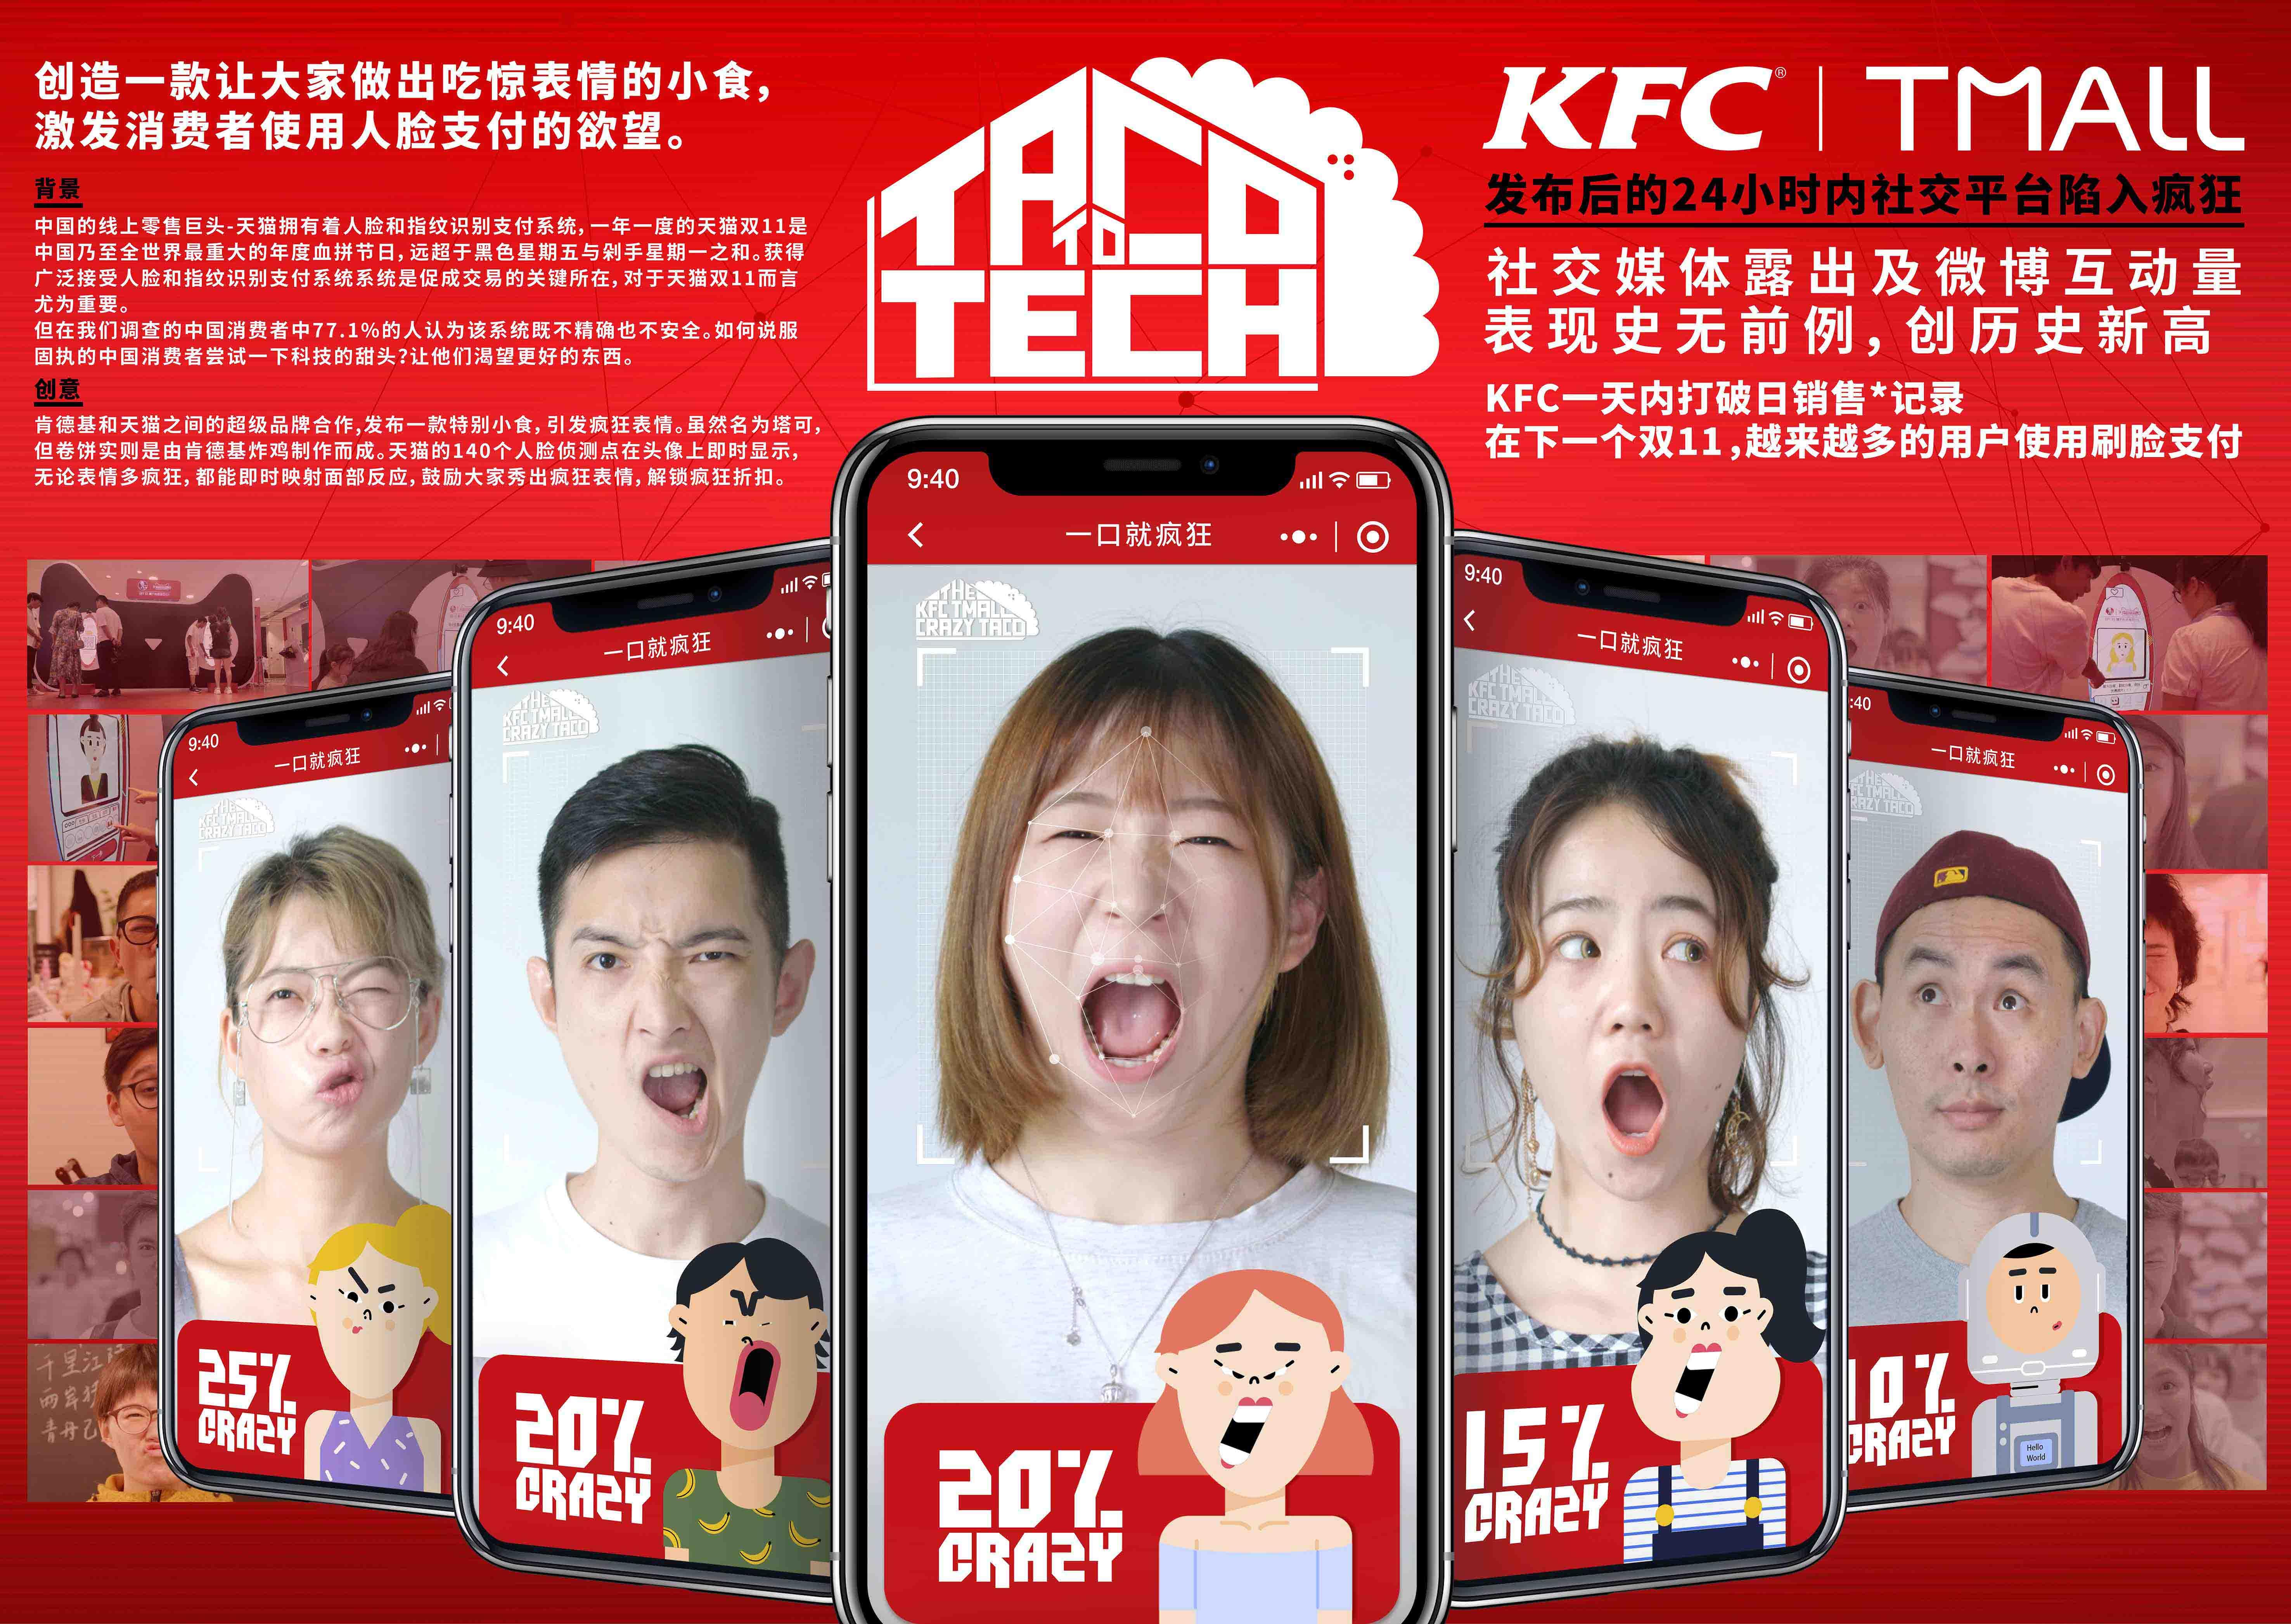 2019_cn_2019_e192-bs-163276306_hero_1